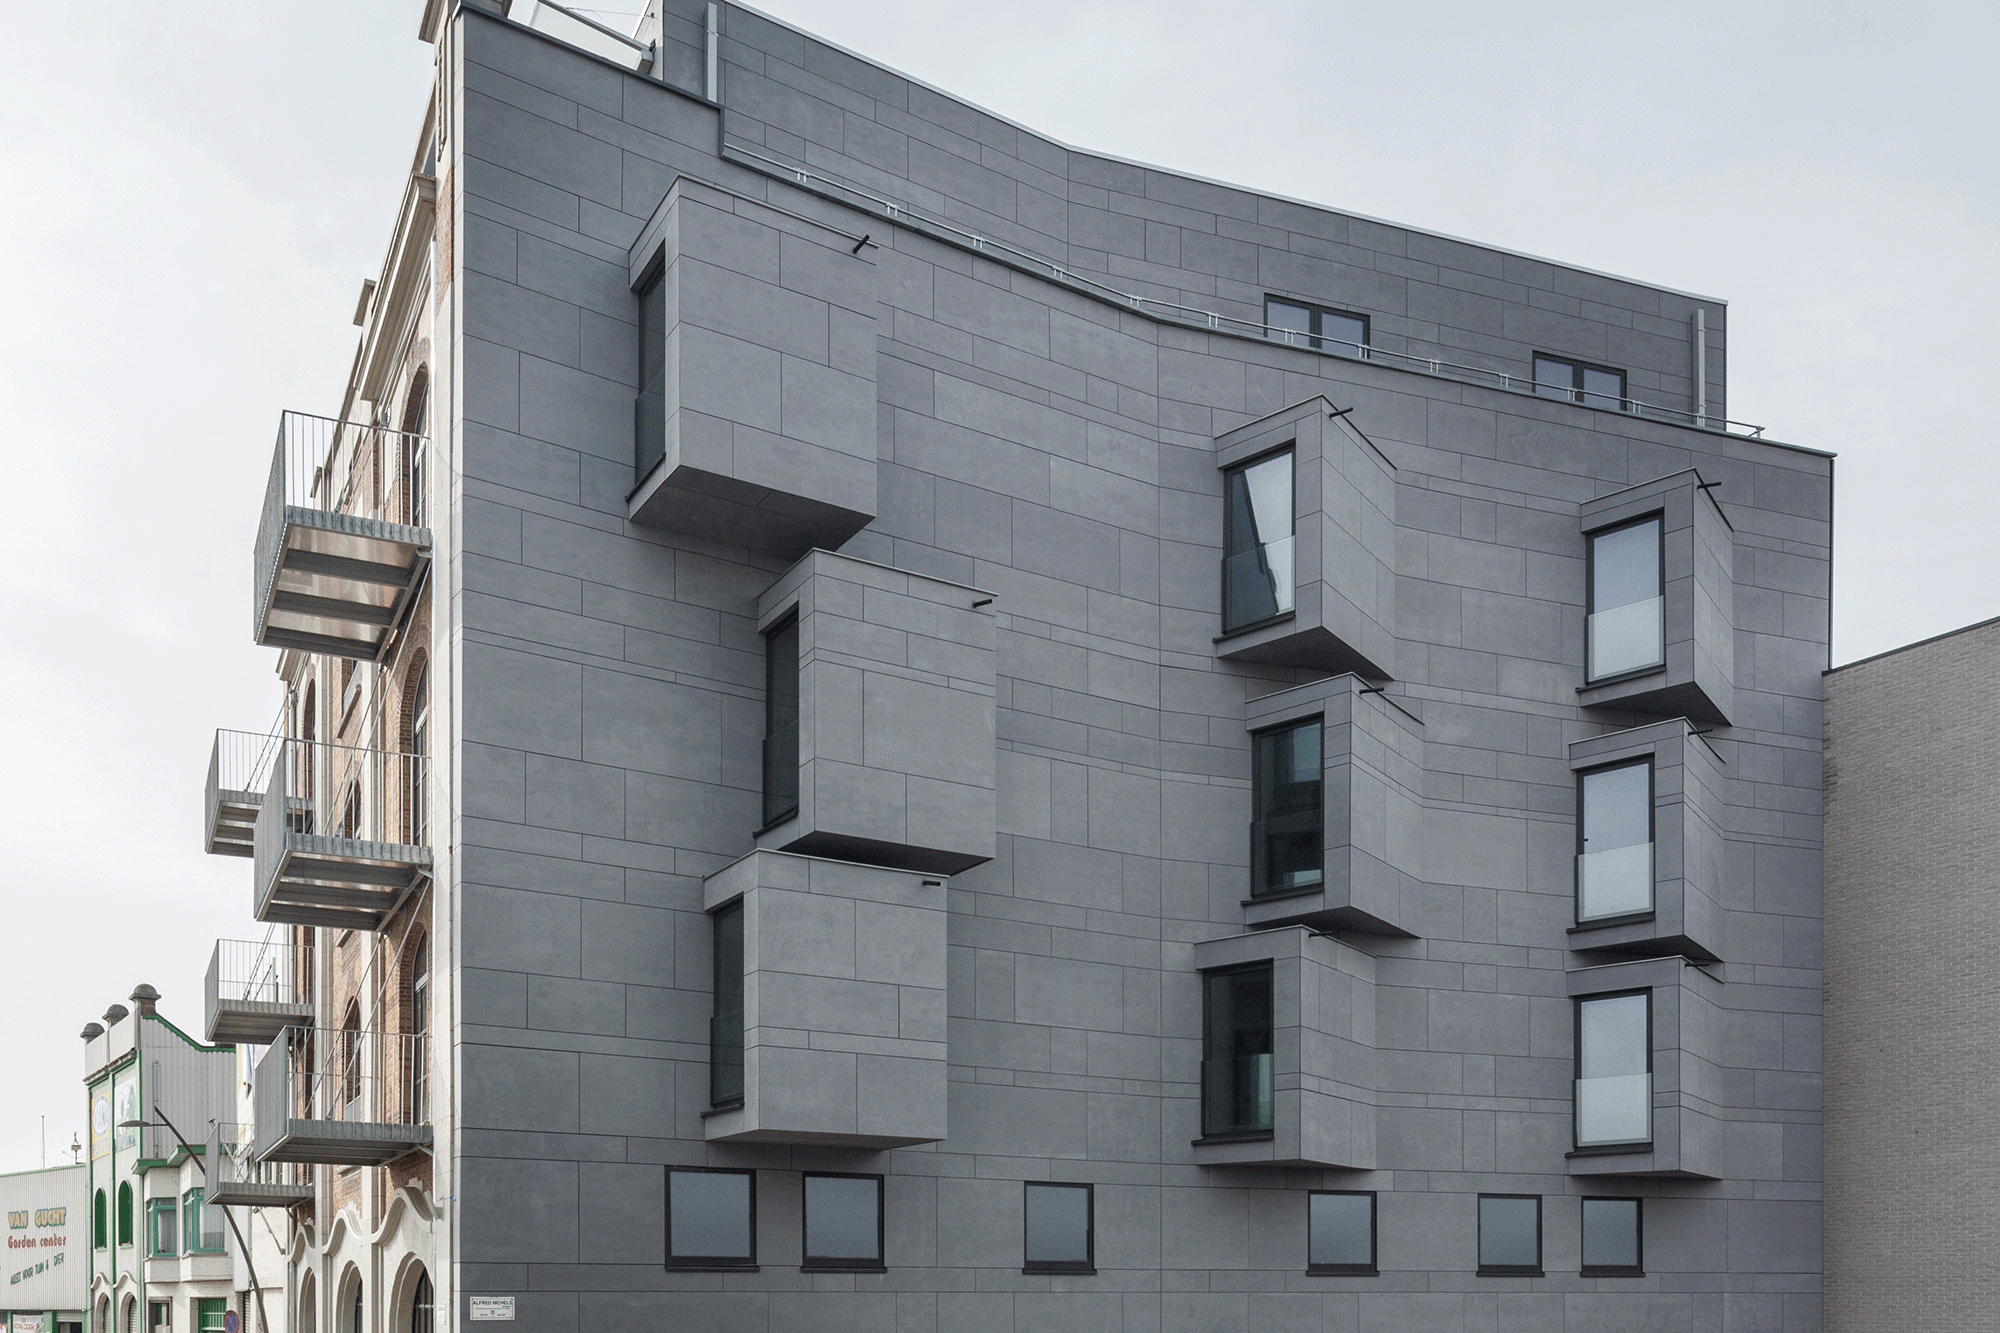 Фасад — википедия. что такое фасад